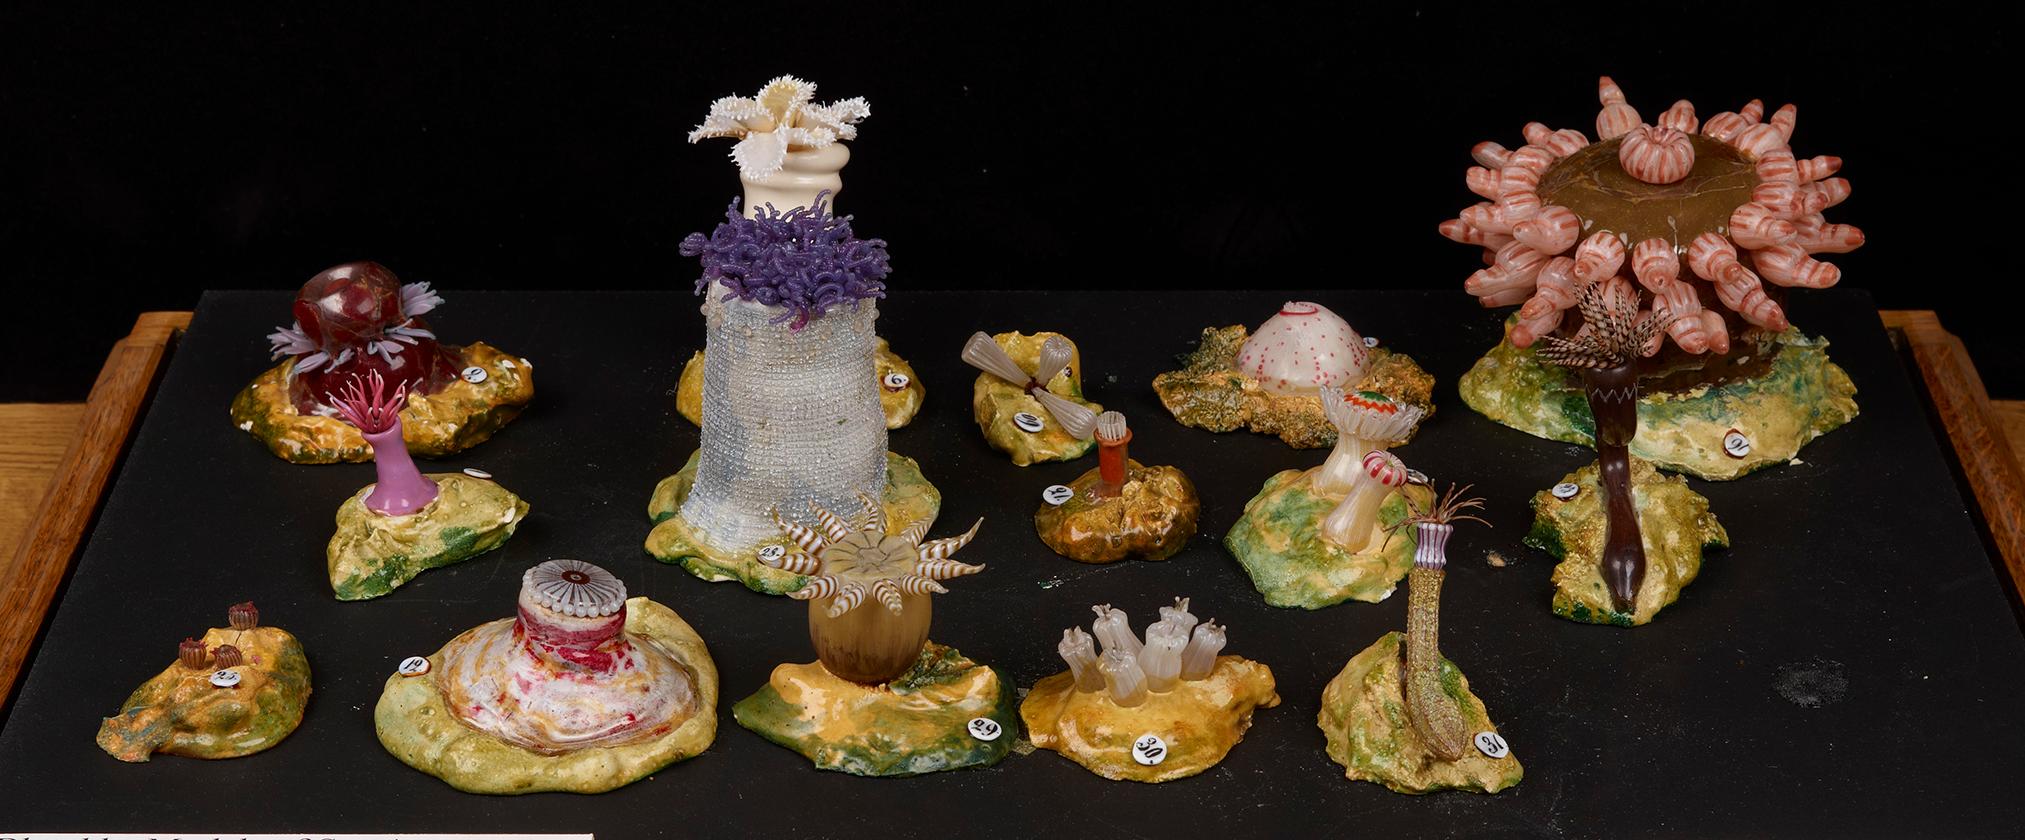 Blaschka models, Oxford University Museum of Natural History